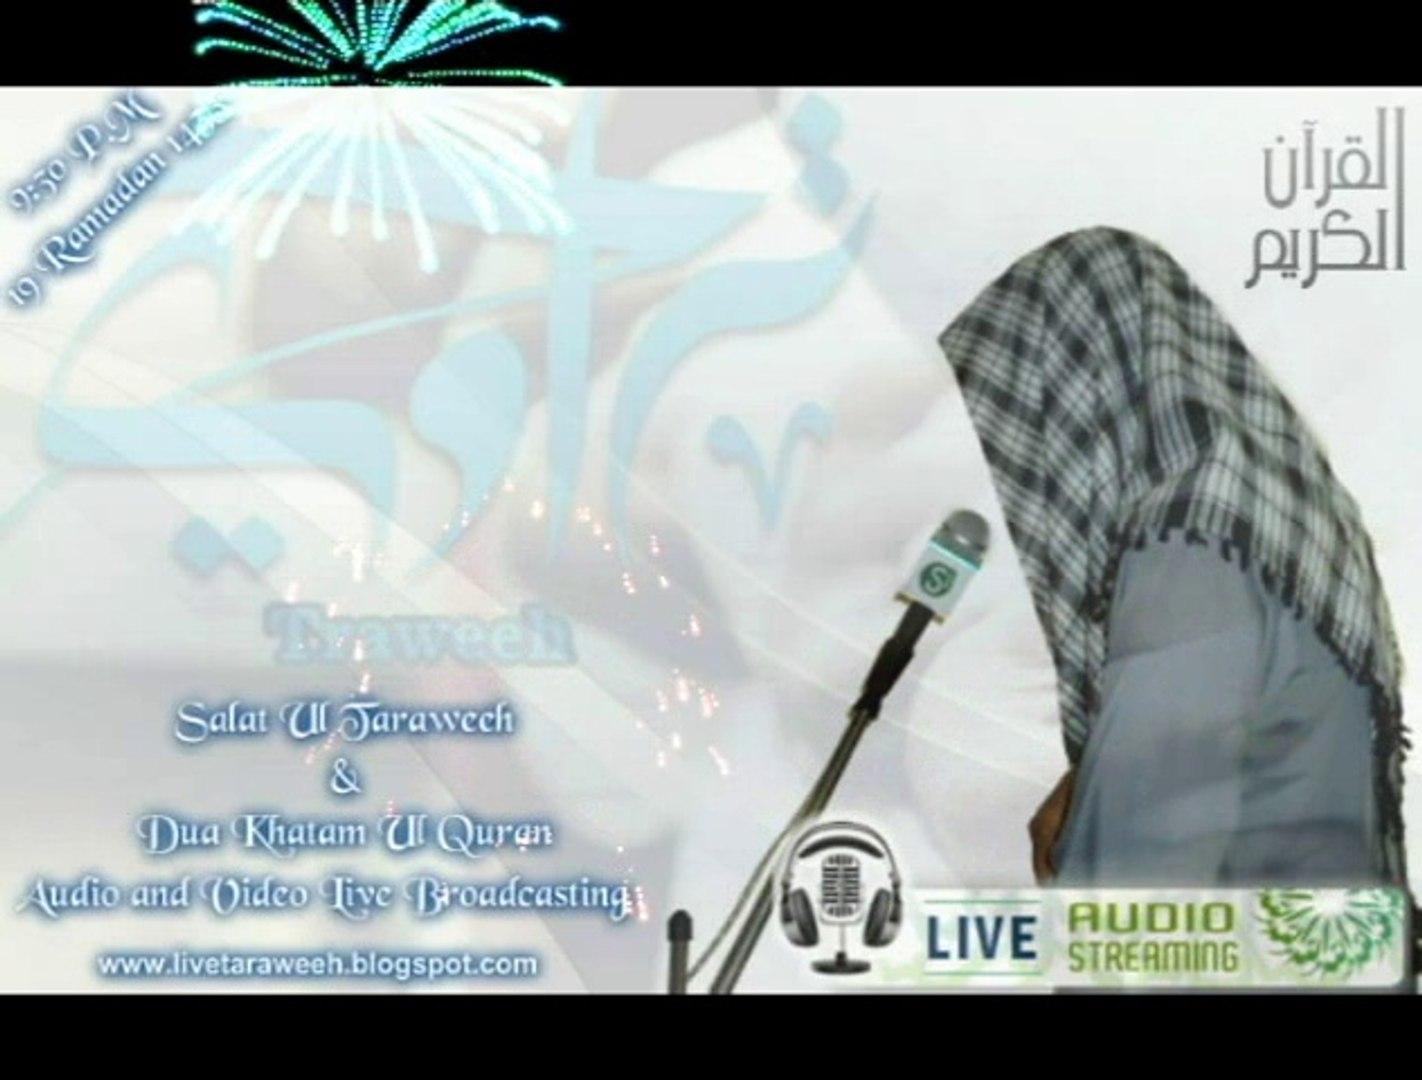 Dua e Khatm-ul-Quran on 19 Ramadan 1435 Live on LiveTaraweeh